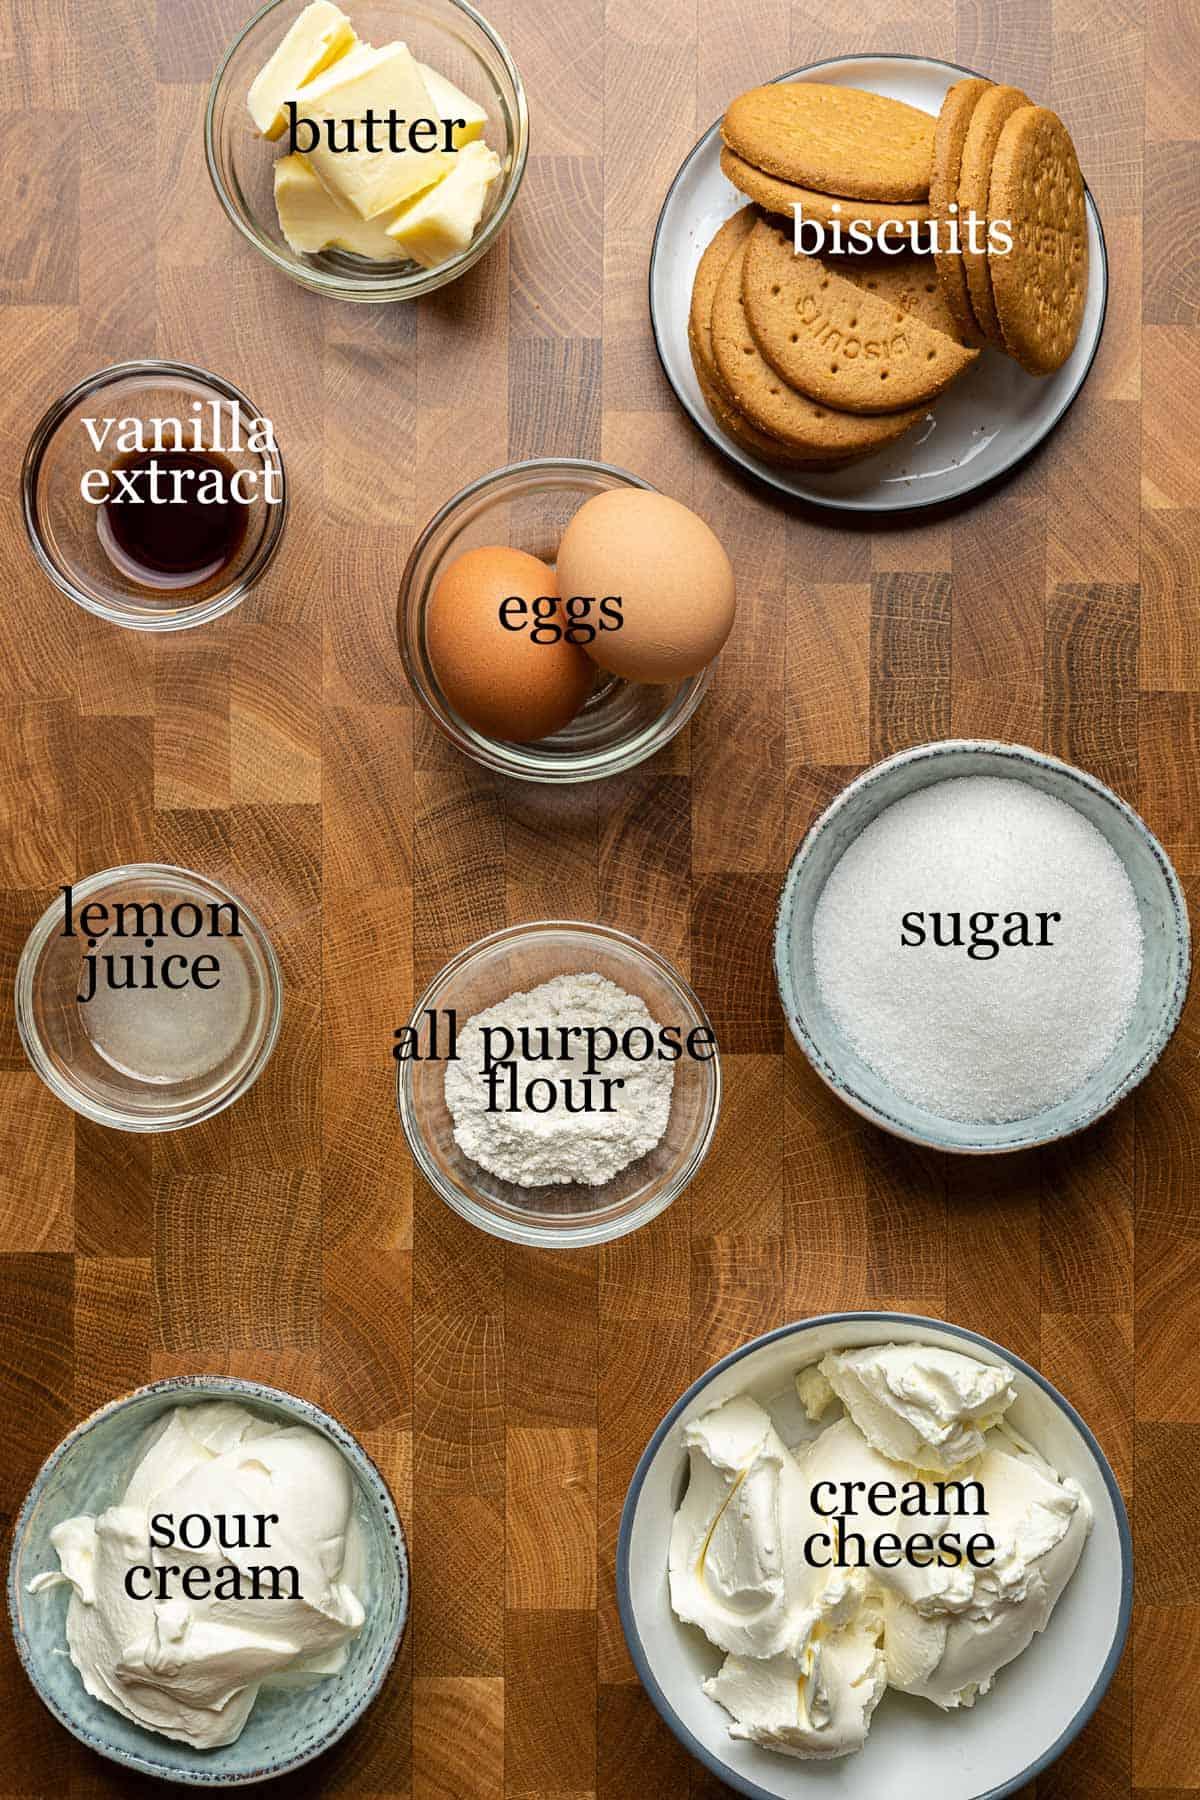 Ingredients to make easy mini cheesecakes